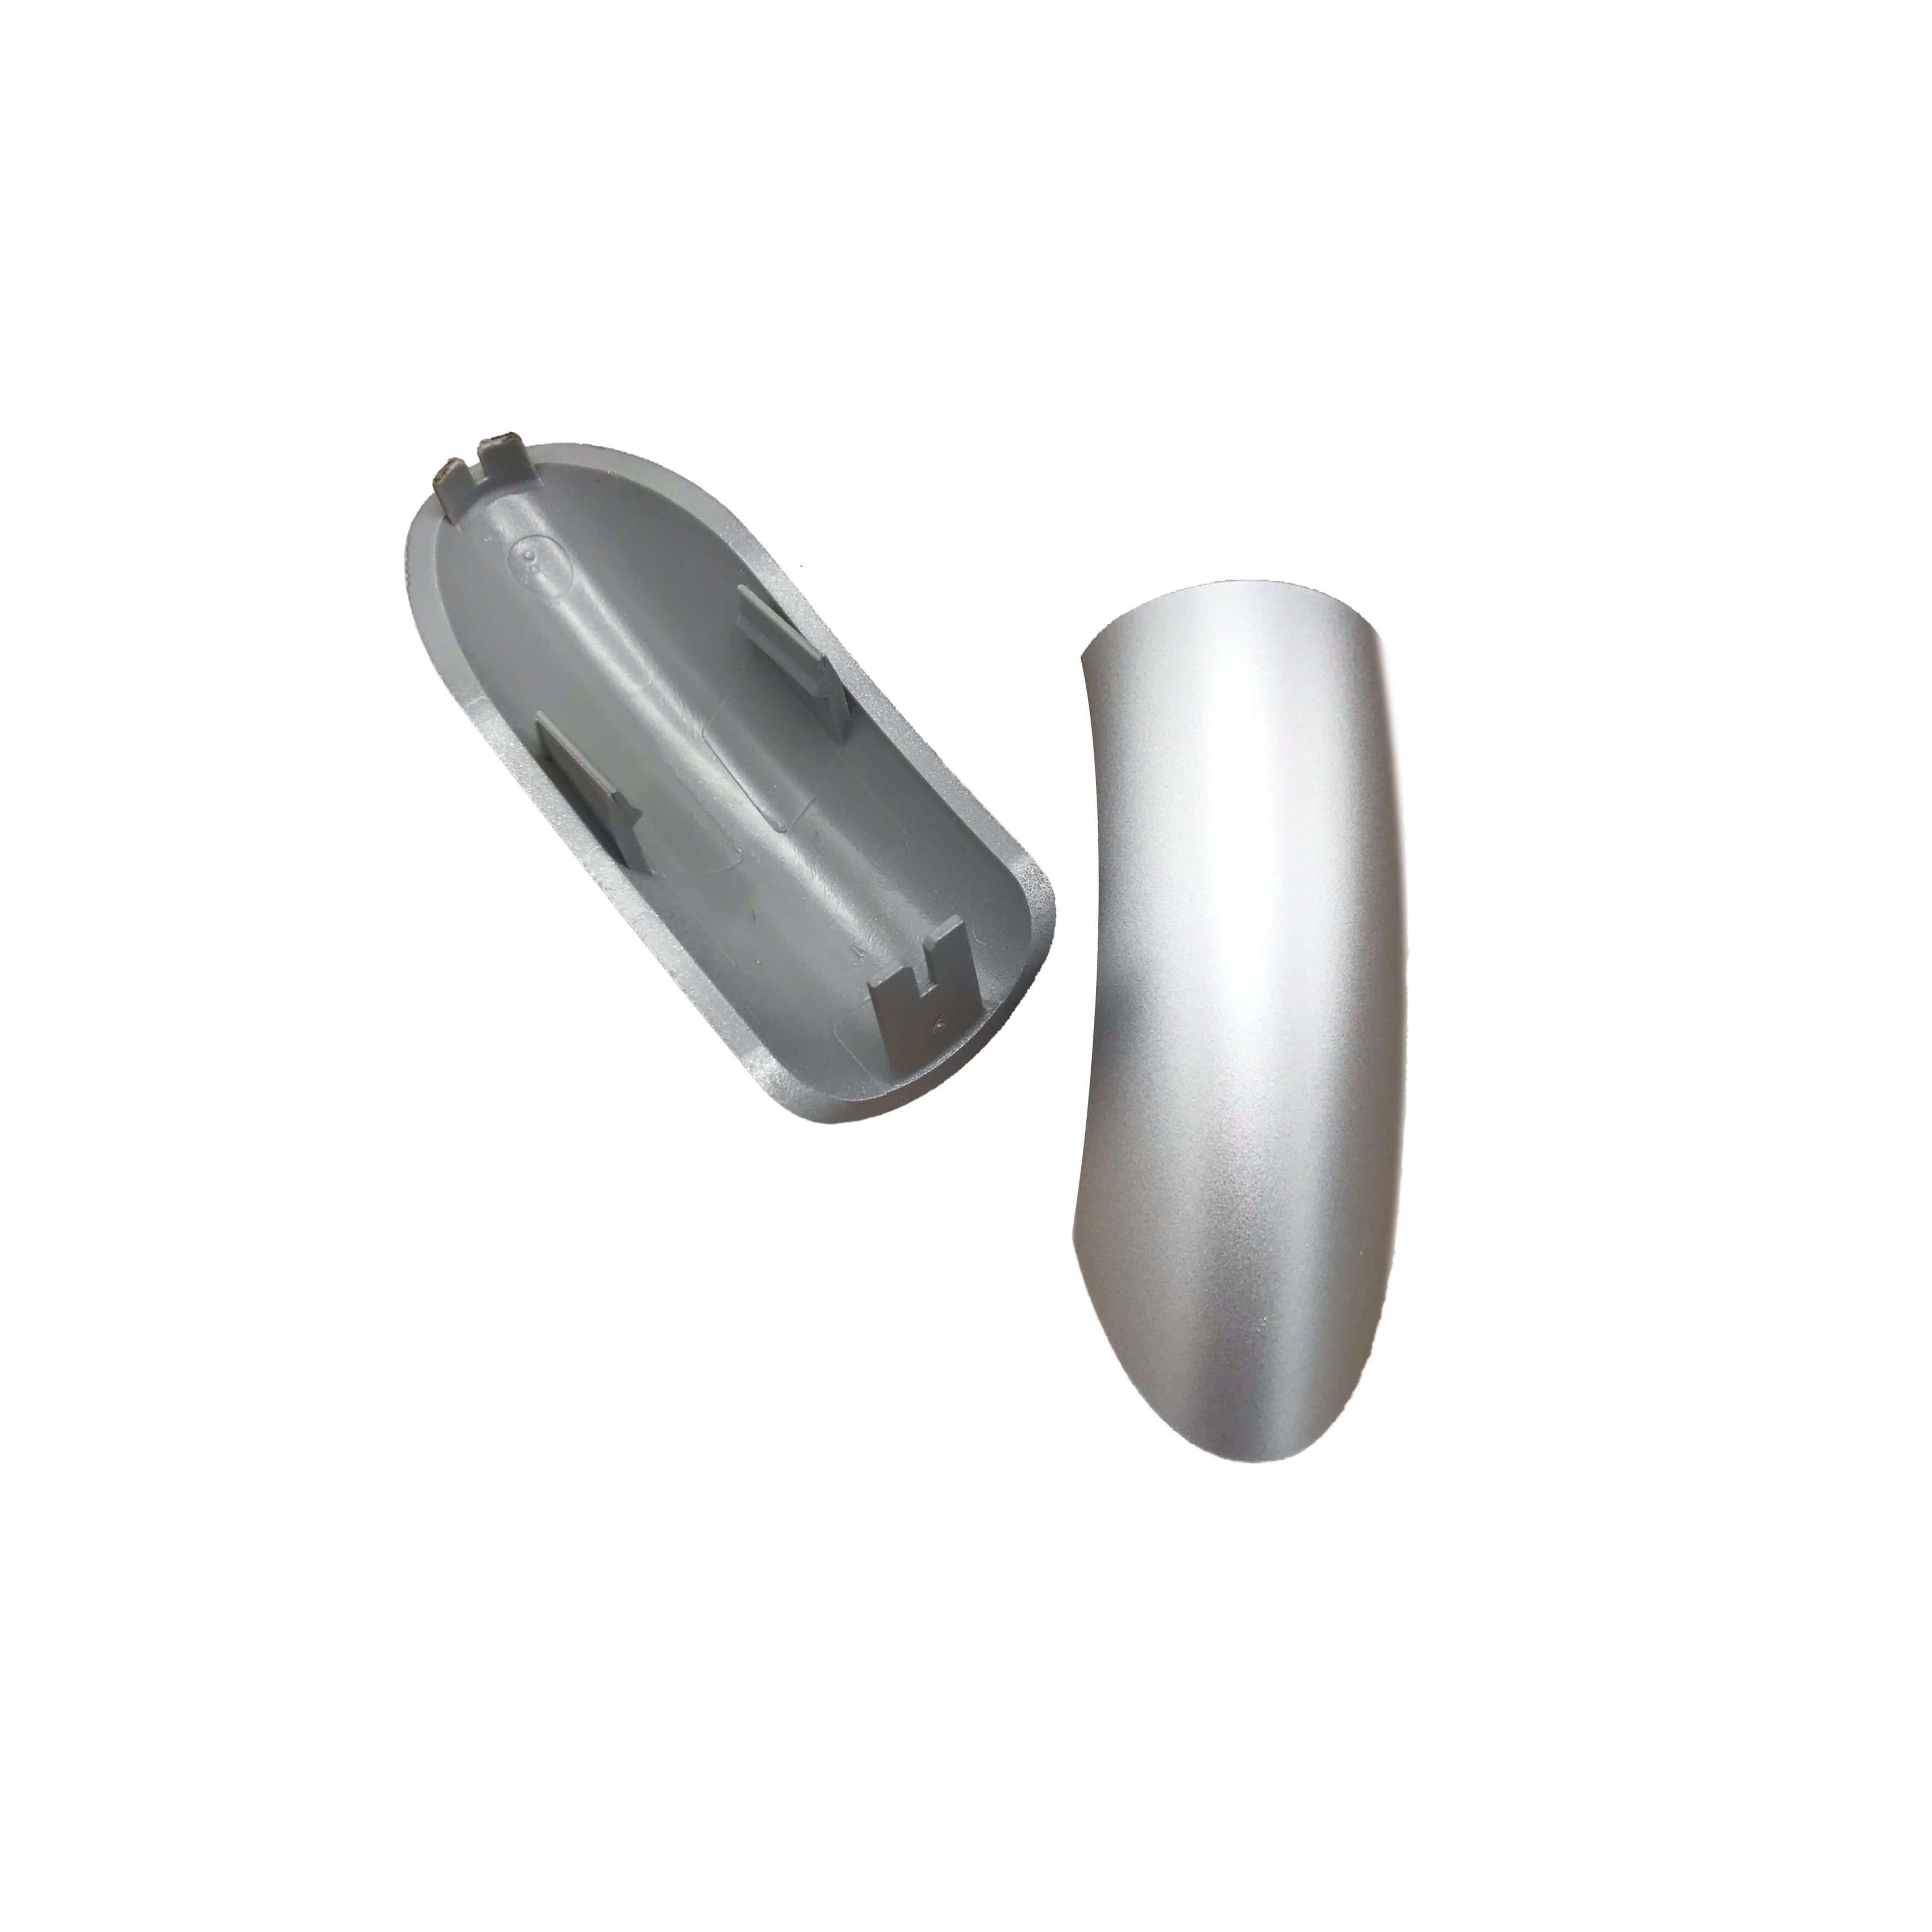 Aqualisa Rail End Cover Silver 255704